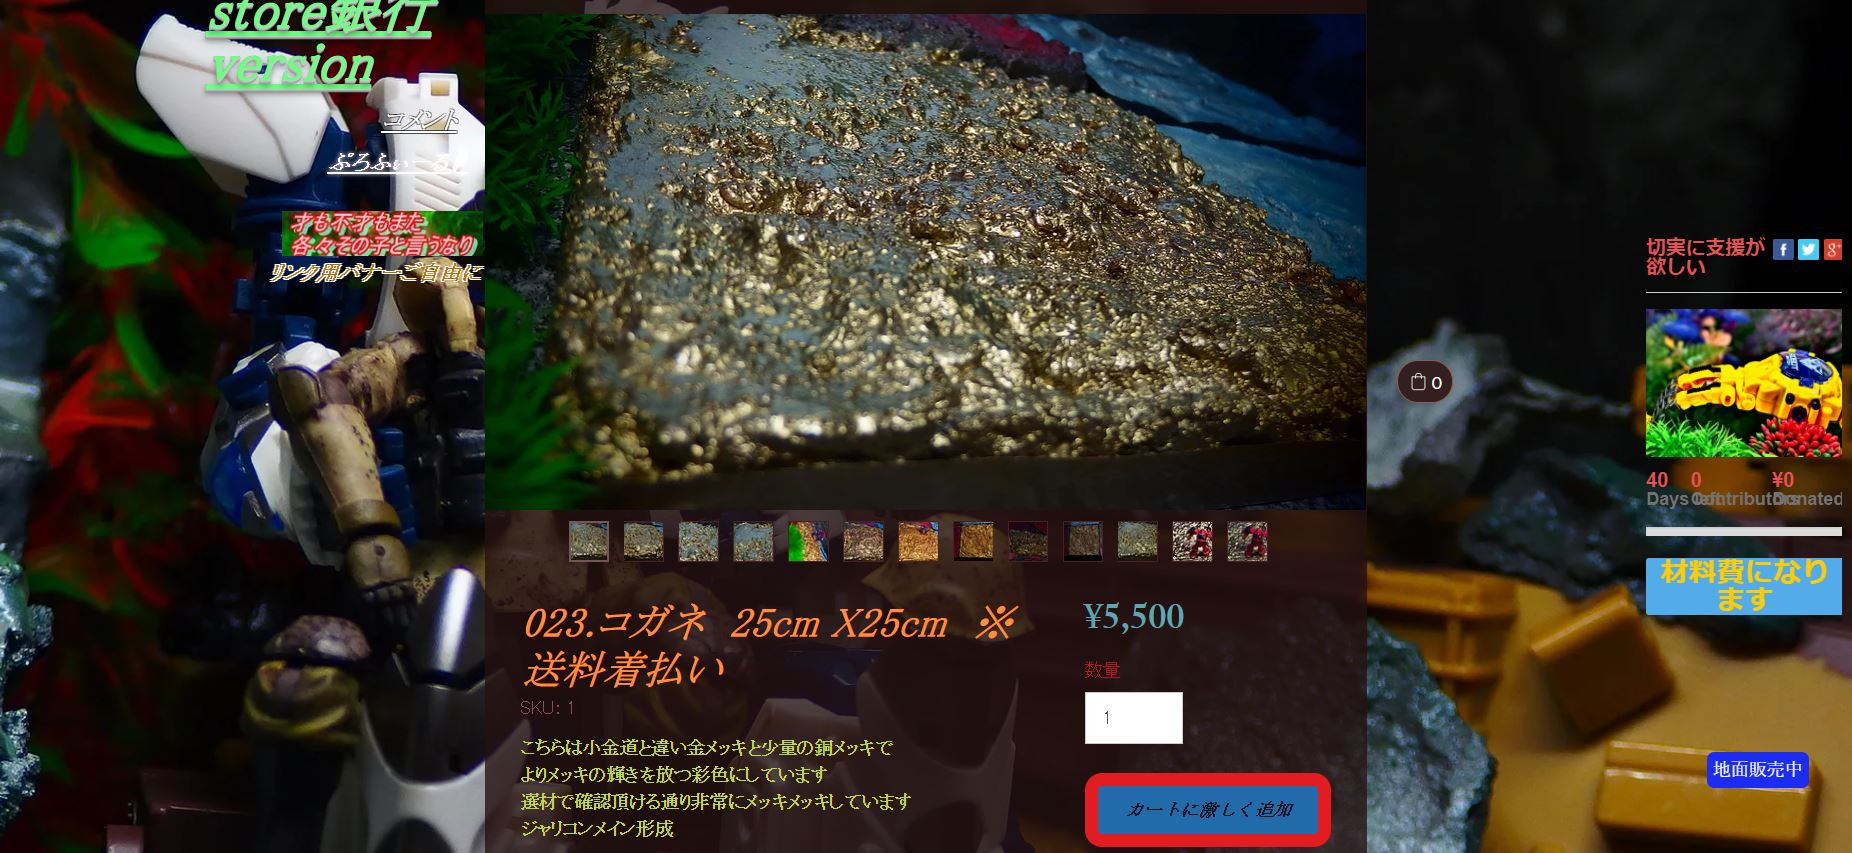 No 023.コガネ 25cm X25cm